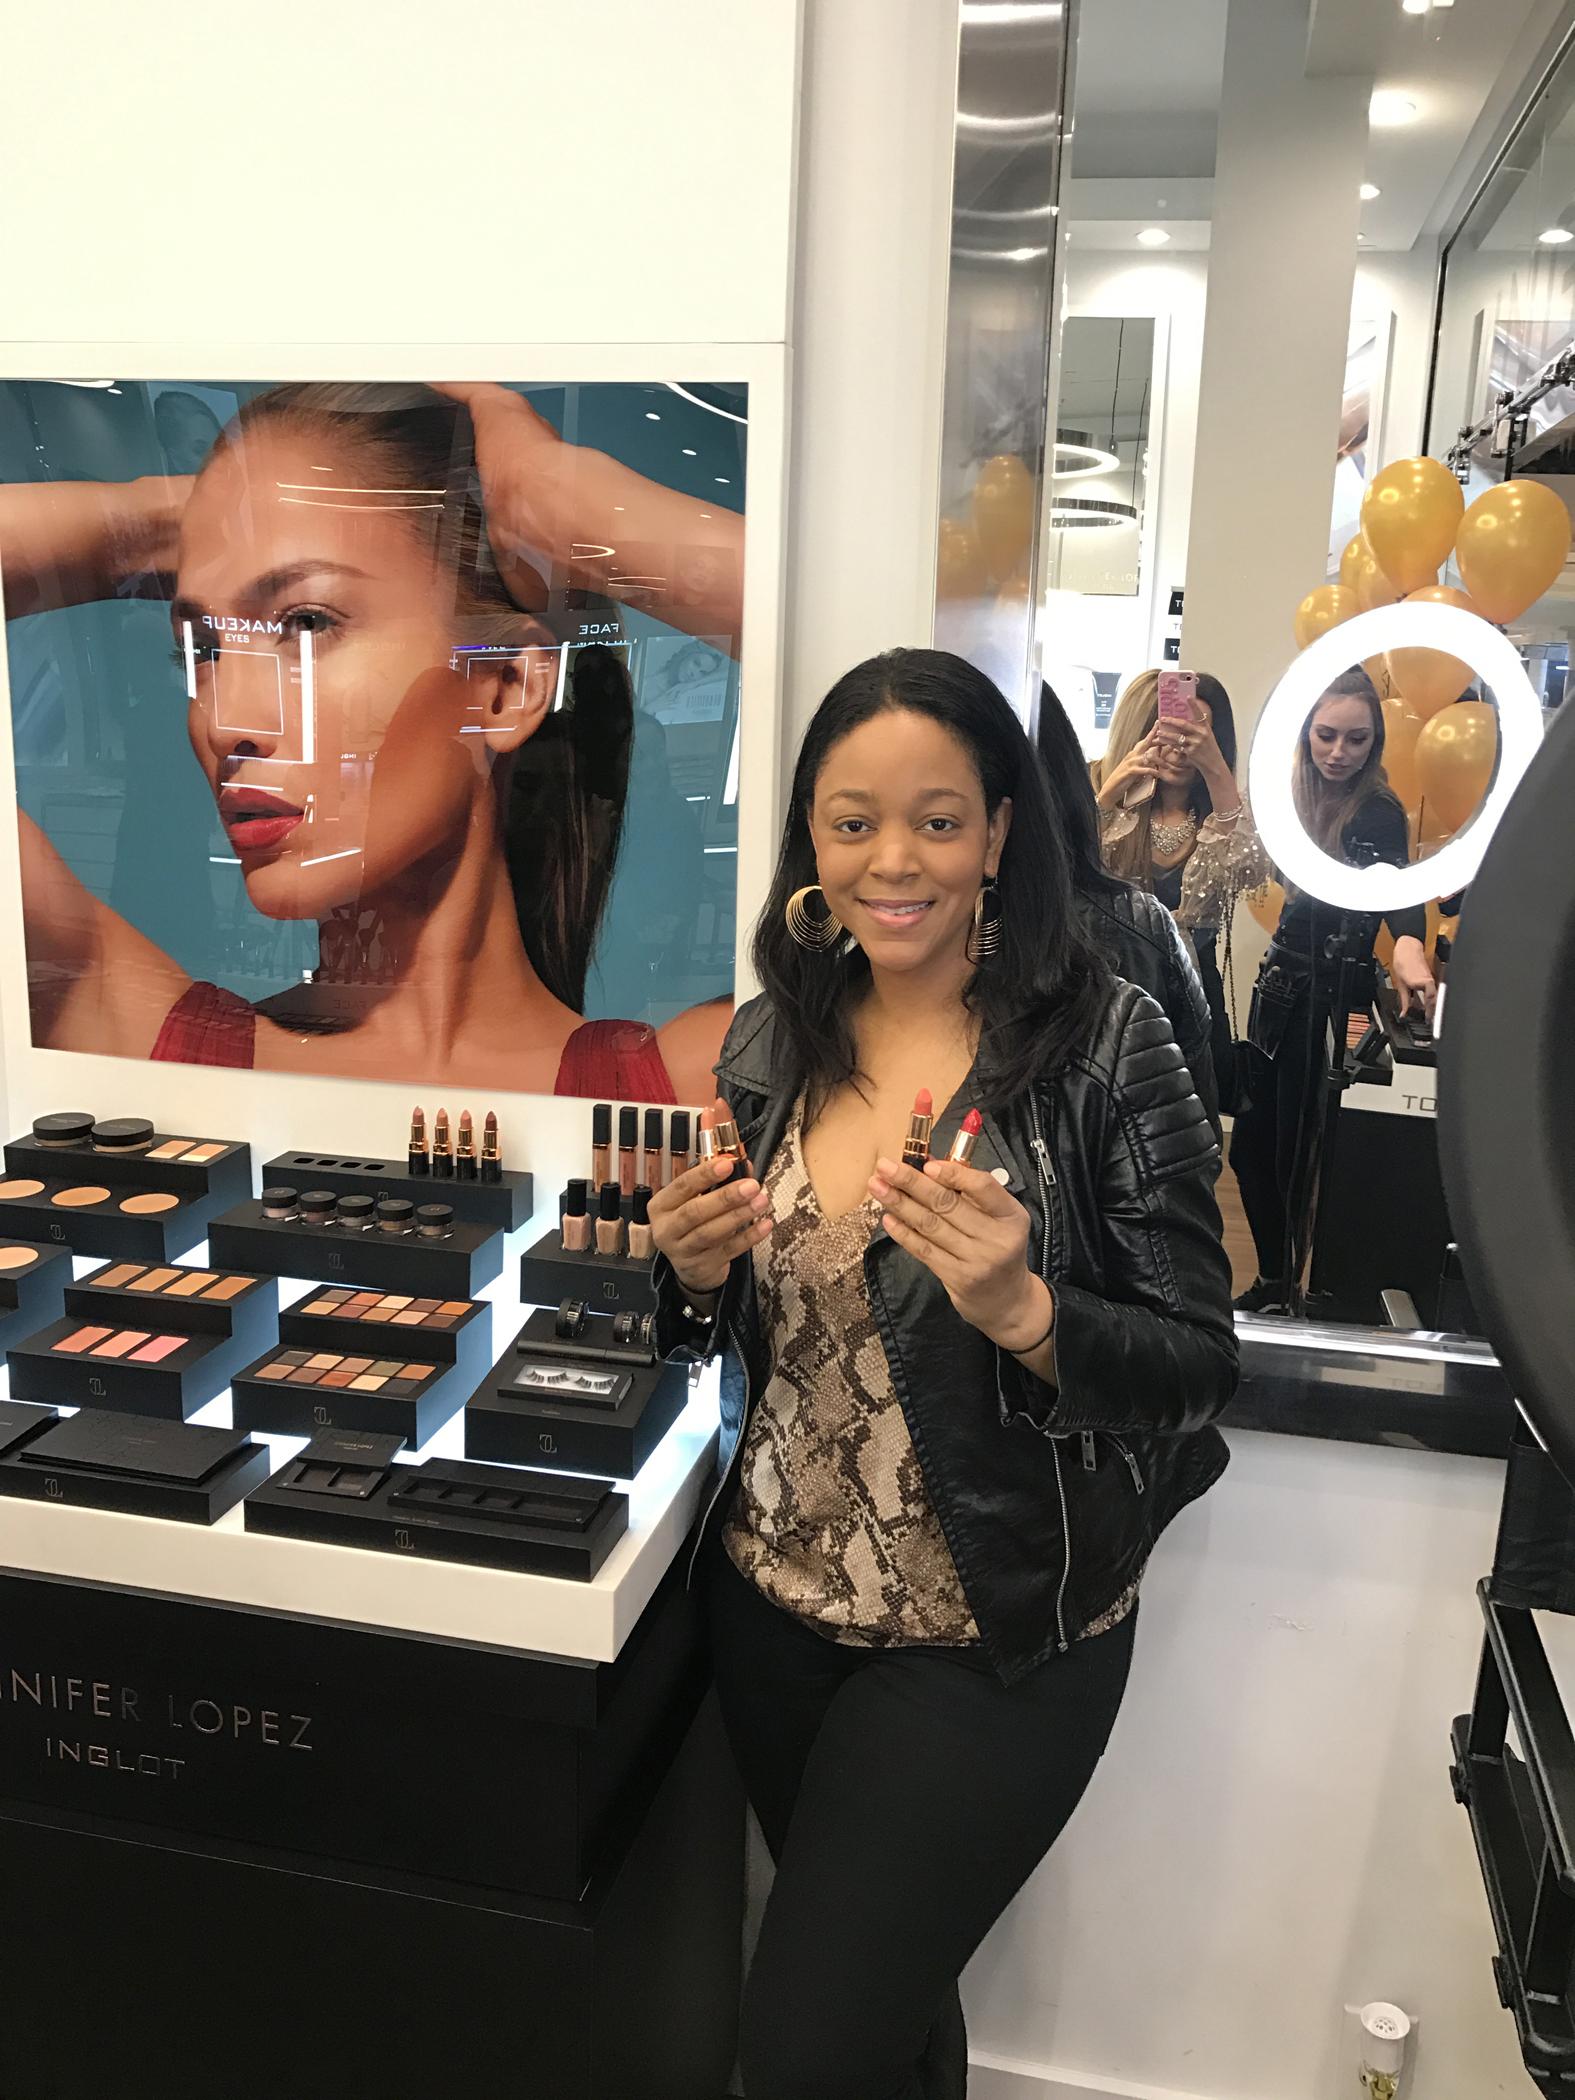 JLo x INGLOT Cosmetics launch